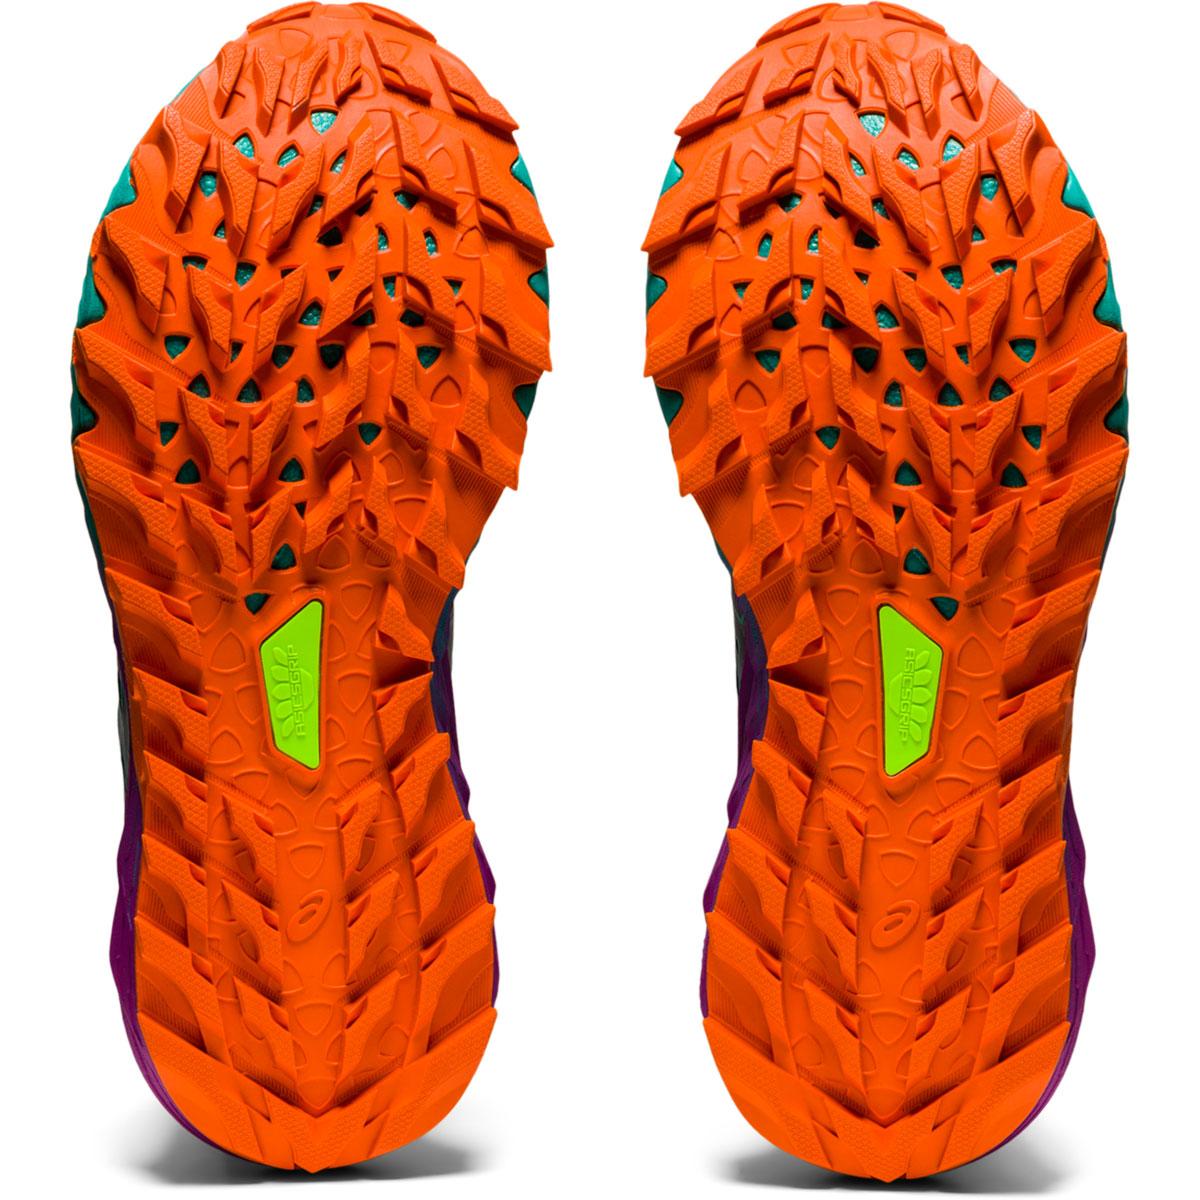 Women's Asics Gel-Trabuco 9 Running Shoe - Color: Black/Baltic Jewel - Size: 5 - Width: Regular, Black/Baltic Jewel, large, image 3